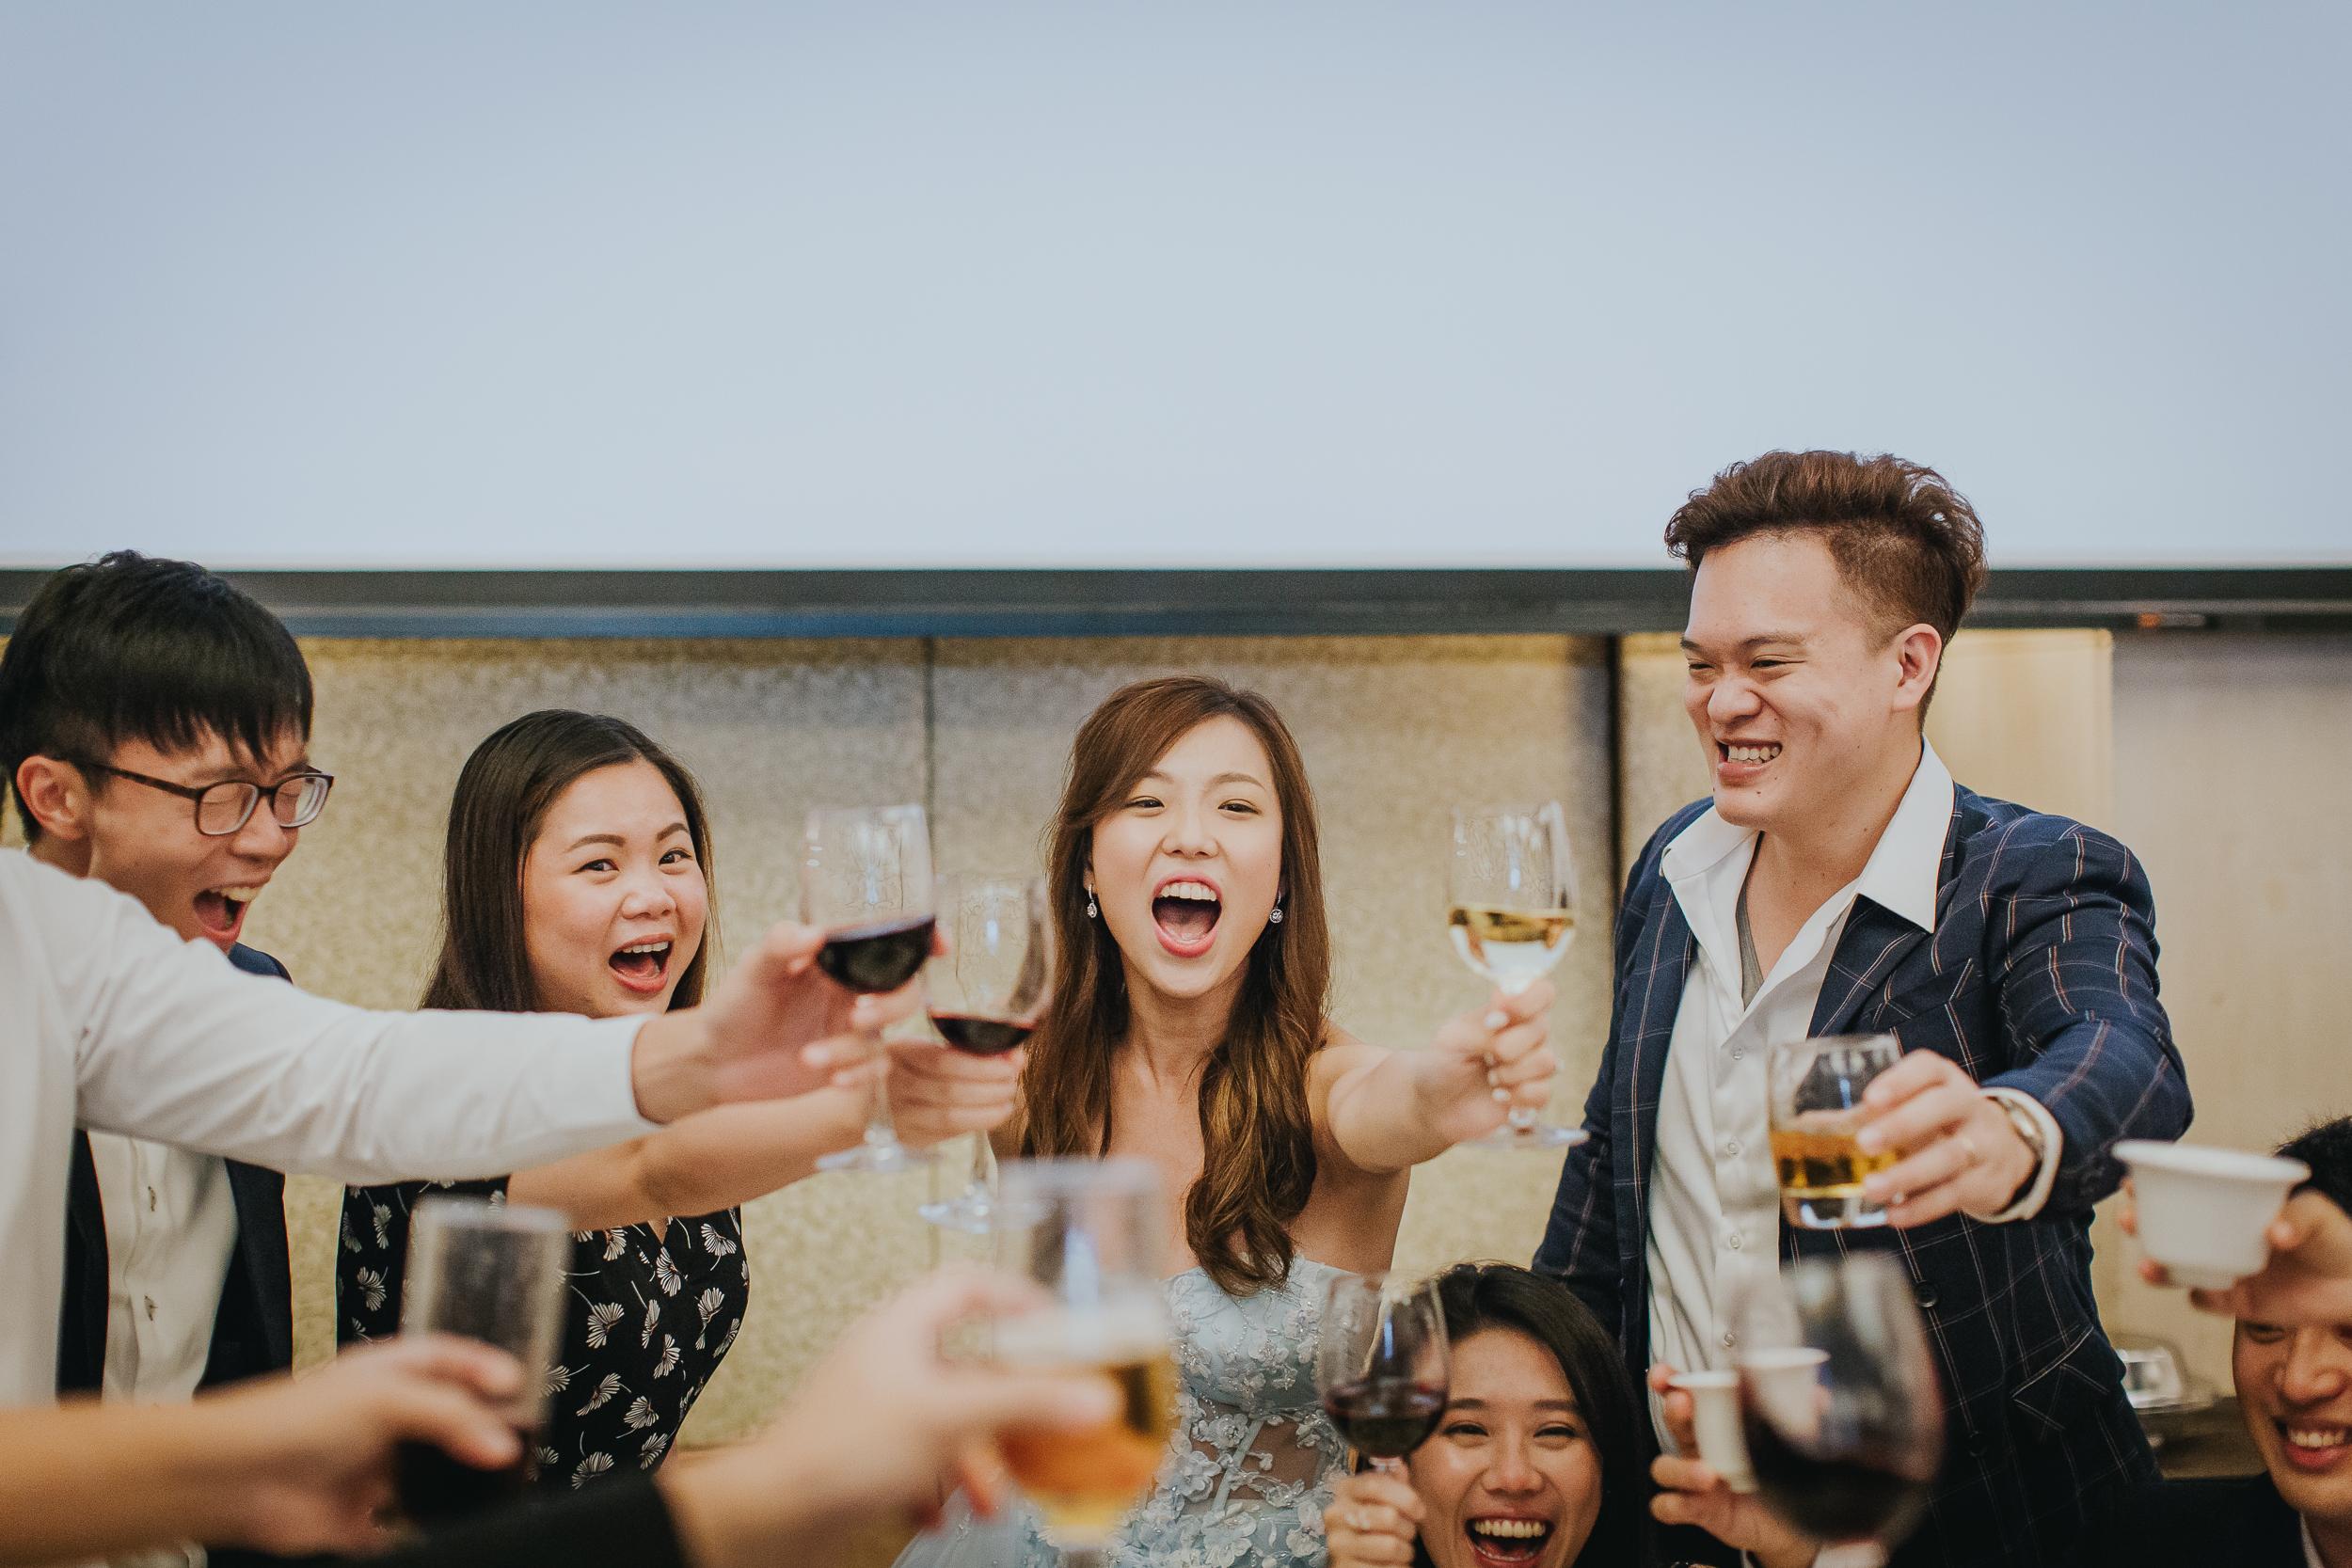 Singapore+Actual+Day+Wedding+Photographer+Grand+Mercure+Oliver+Estelle-0106.jpg